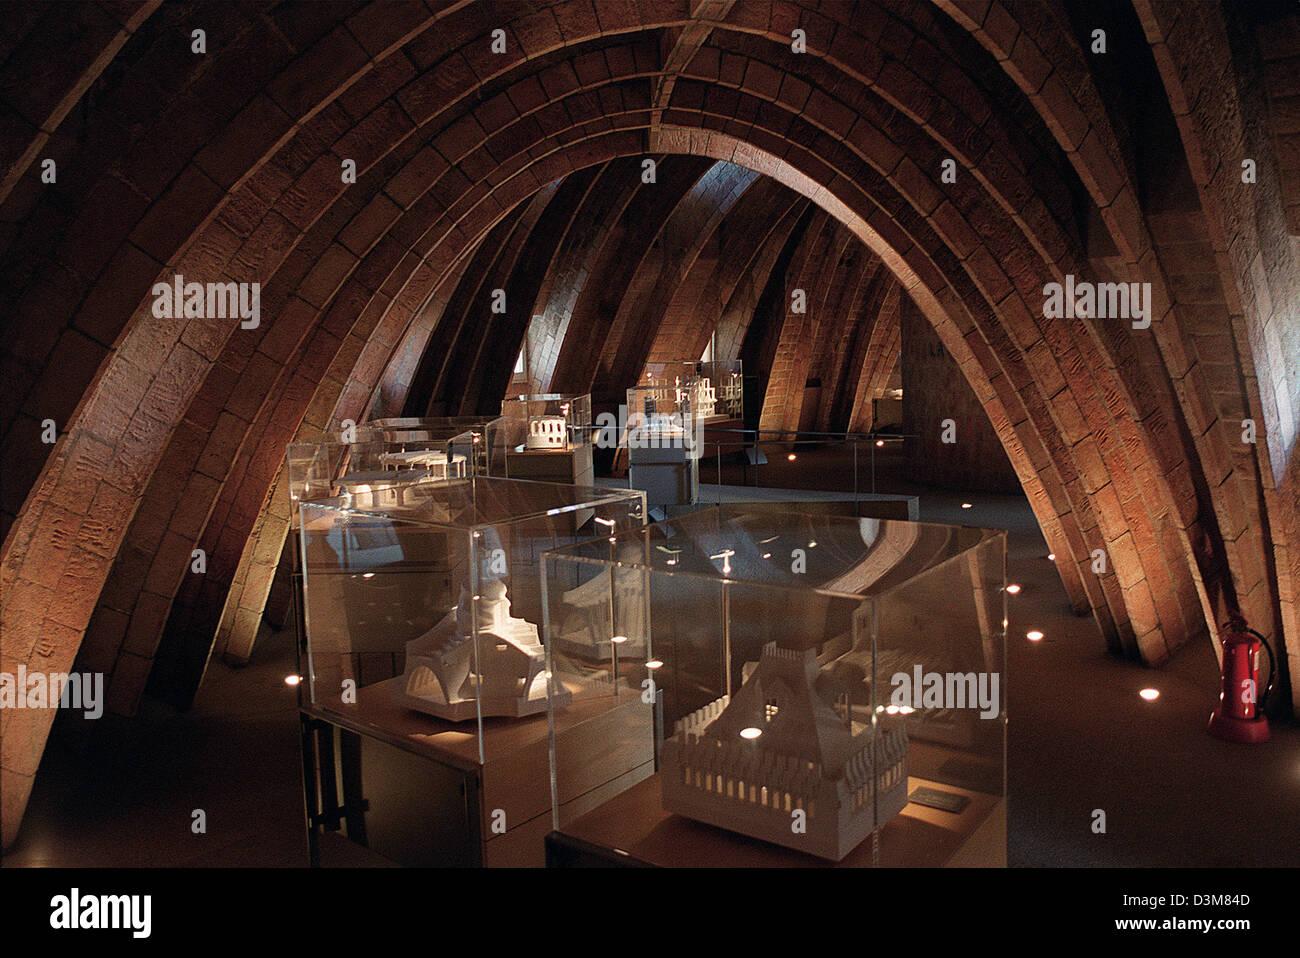 (dpa file) - The picture shows a loft in renowned architect Antoni Gaudi's (1852-1926) 'Casa Mila' in - Stock Image